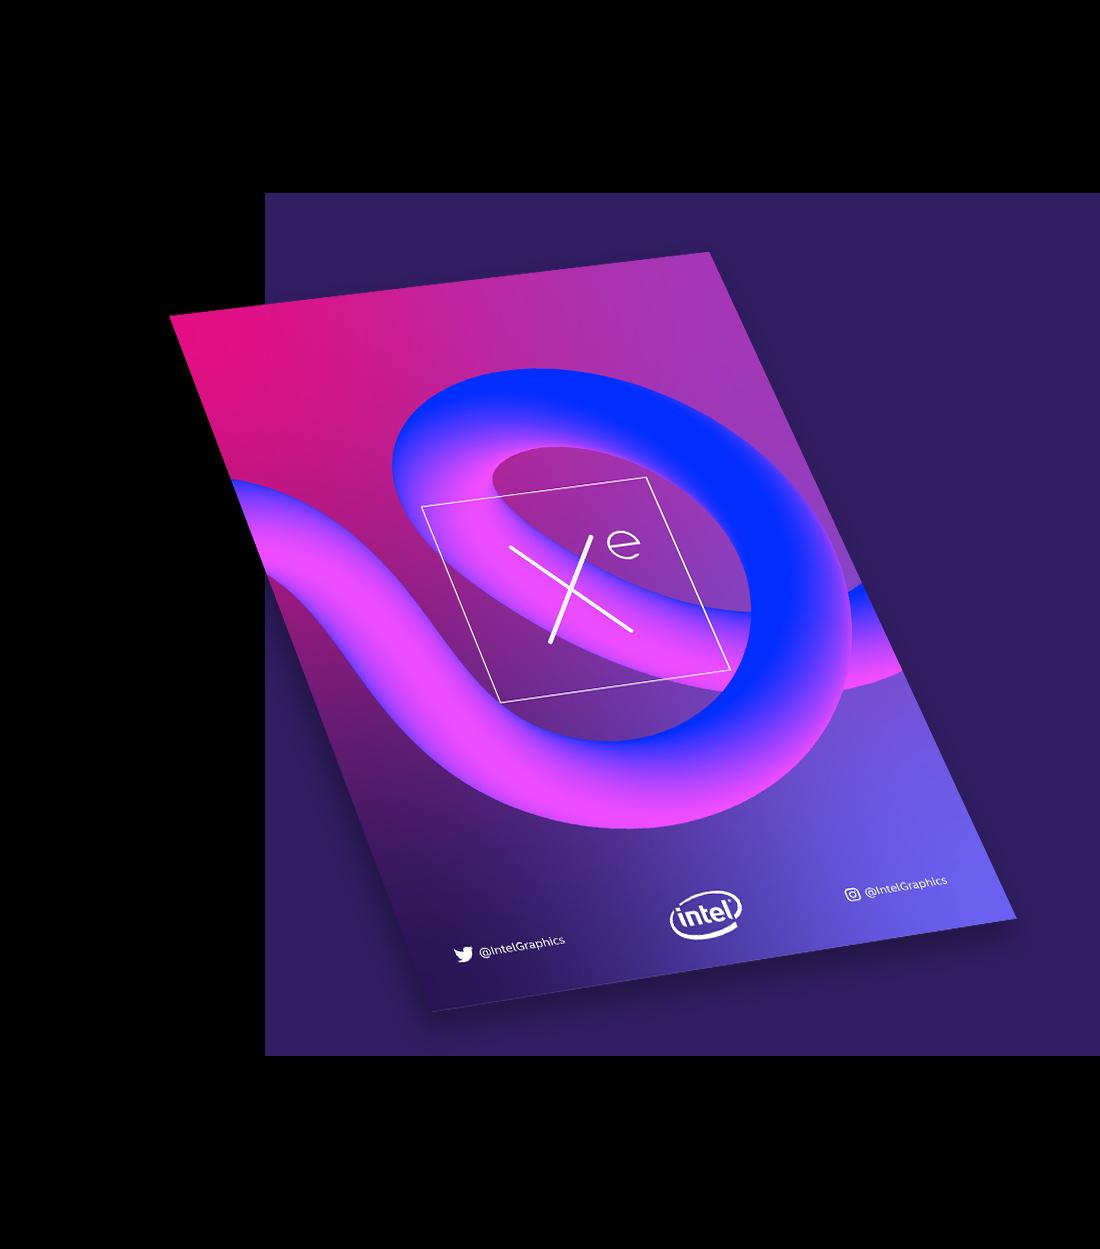 Intel_Art 4